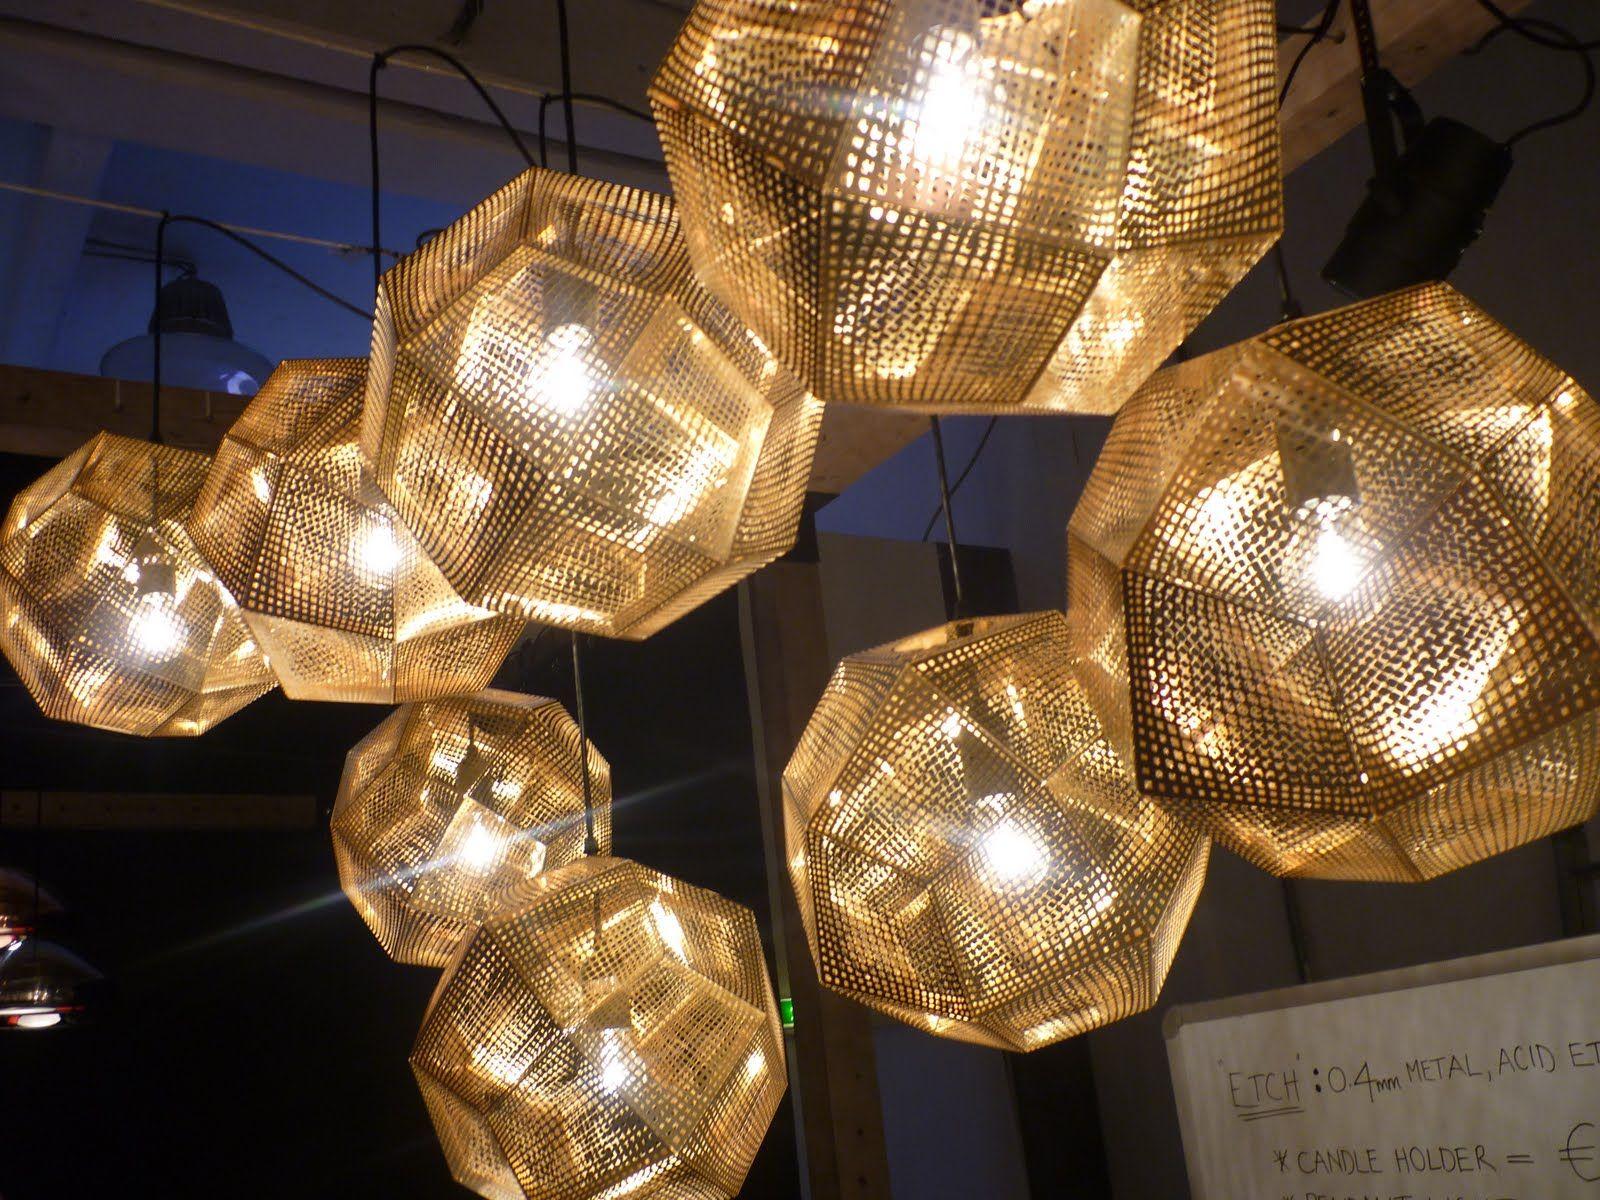 Grid of Stainless Steel and Cooper poligonal light pendants